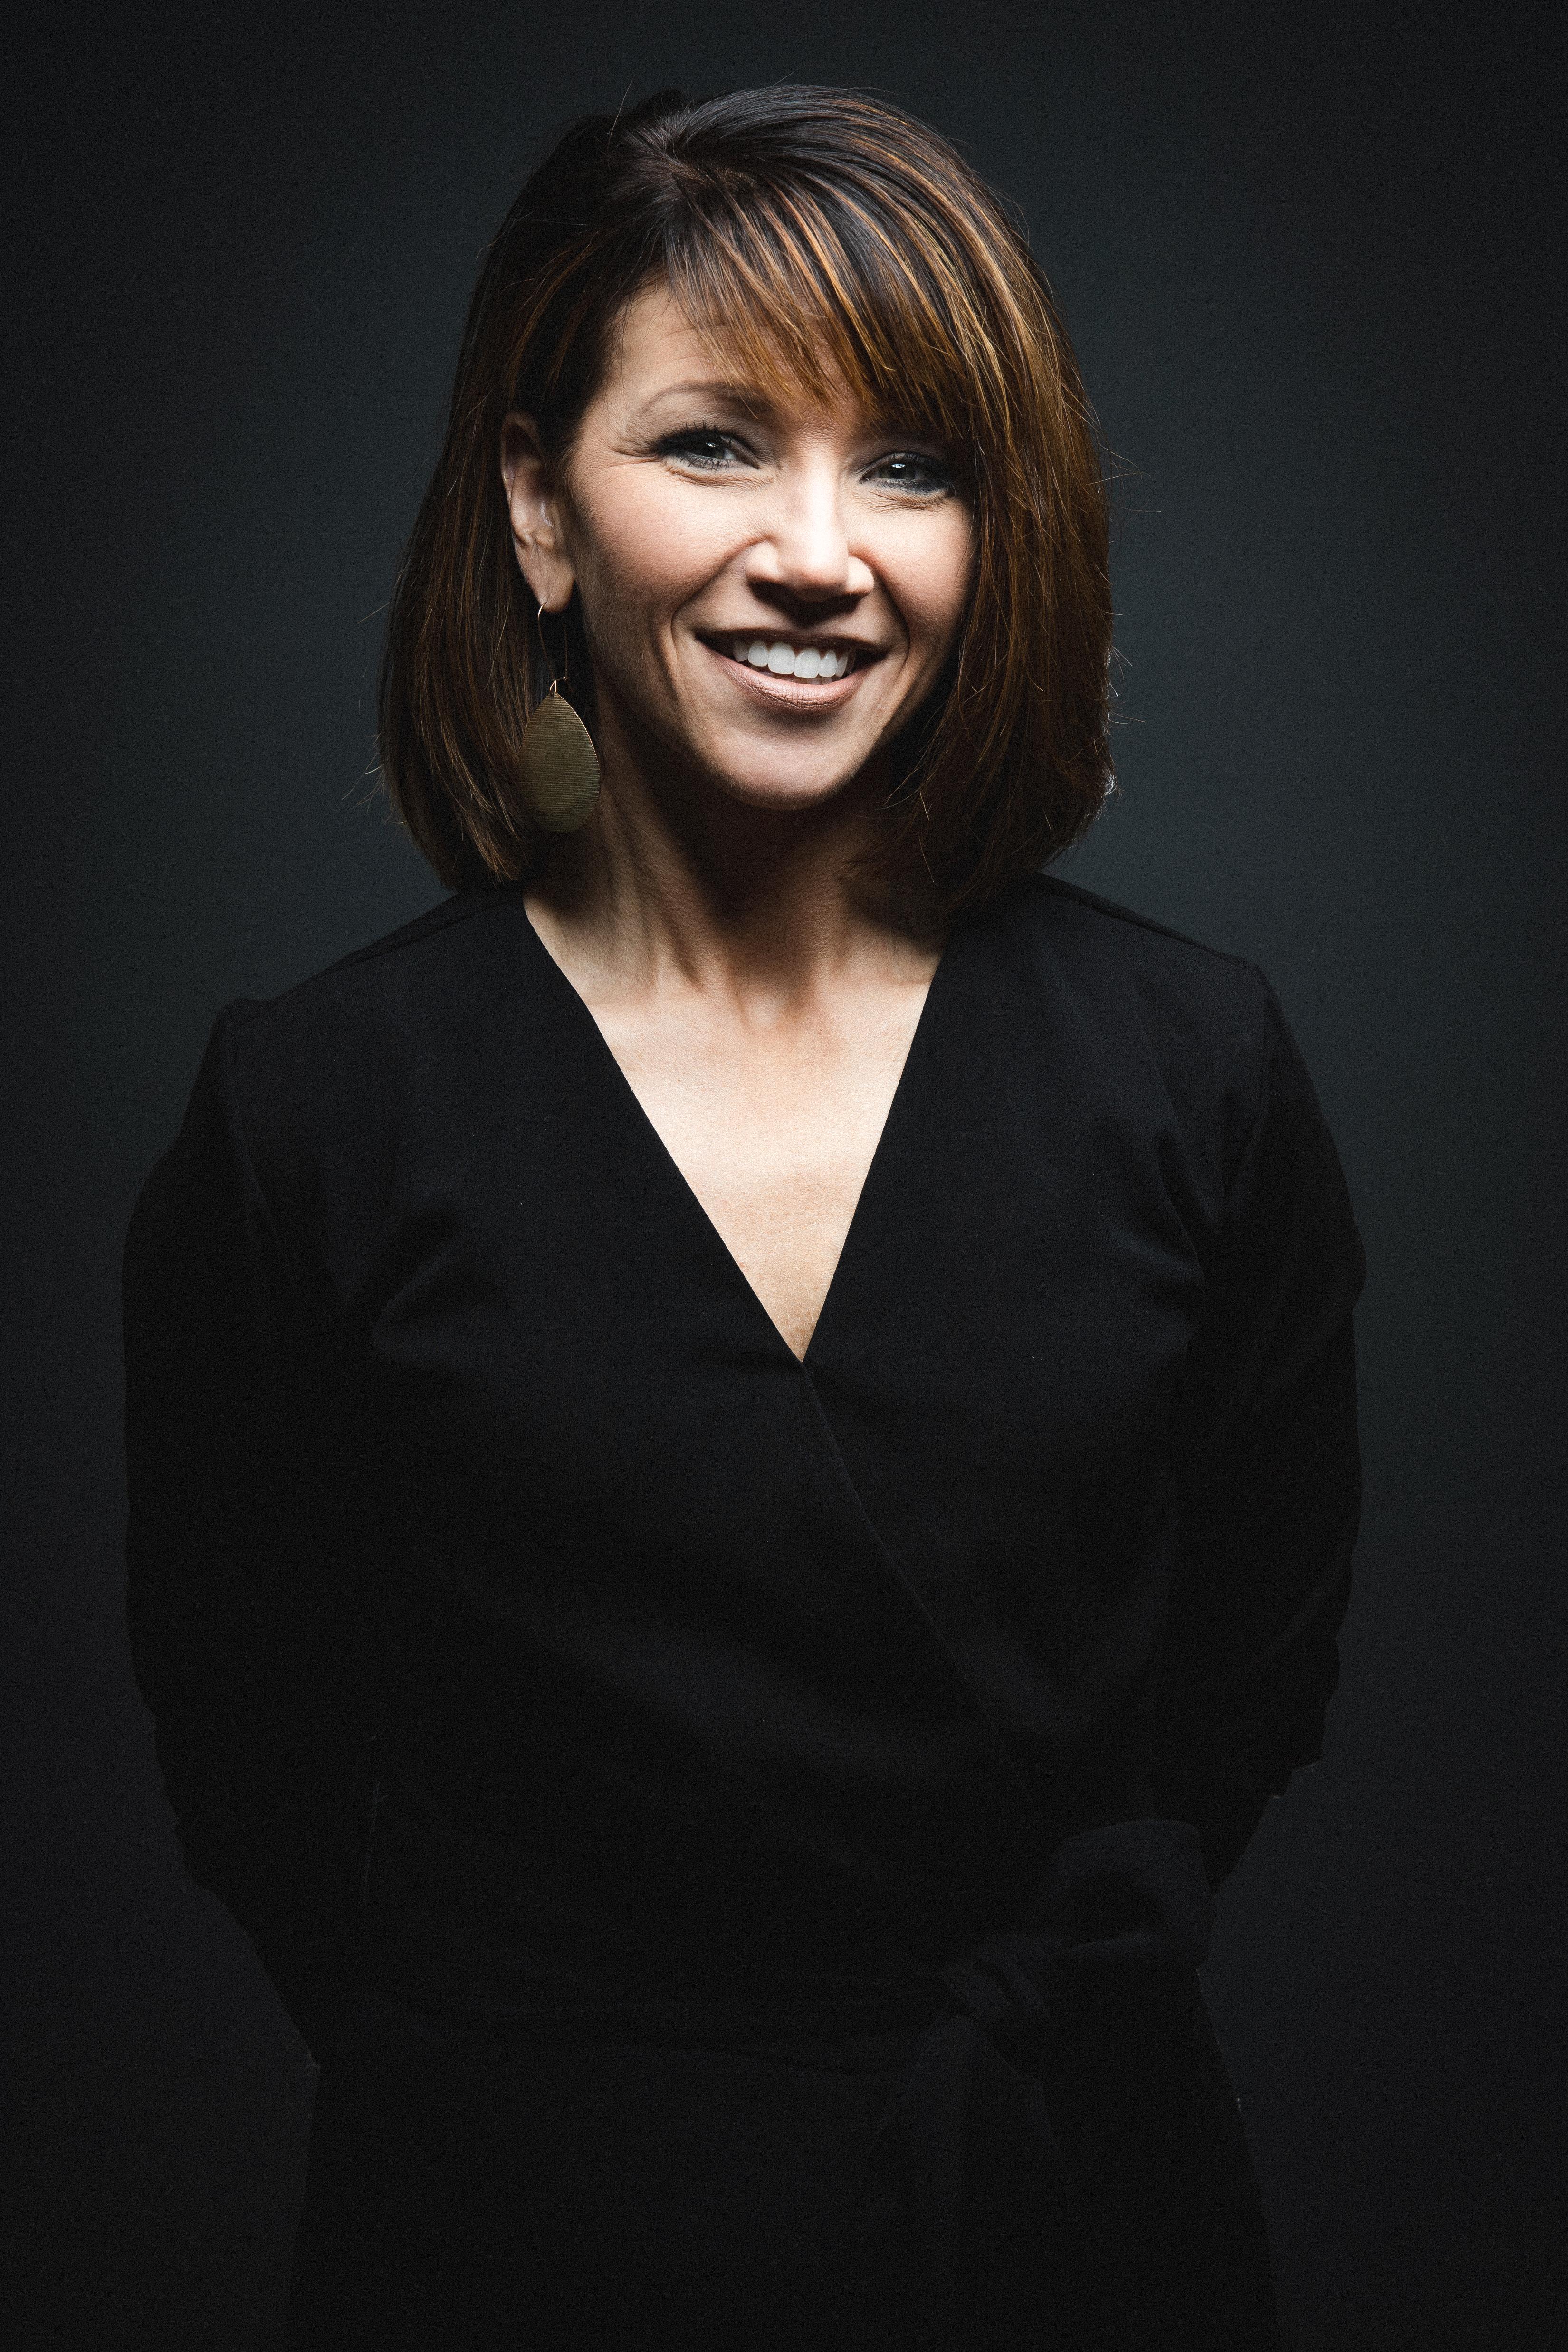 Mindi Cox | 2019 HR Achievement Awards Honorees